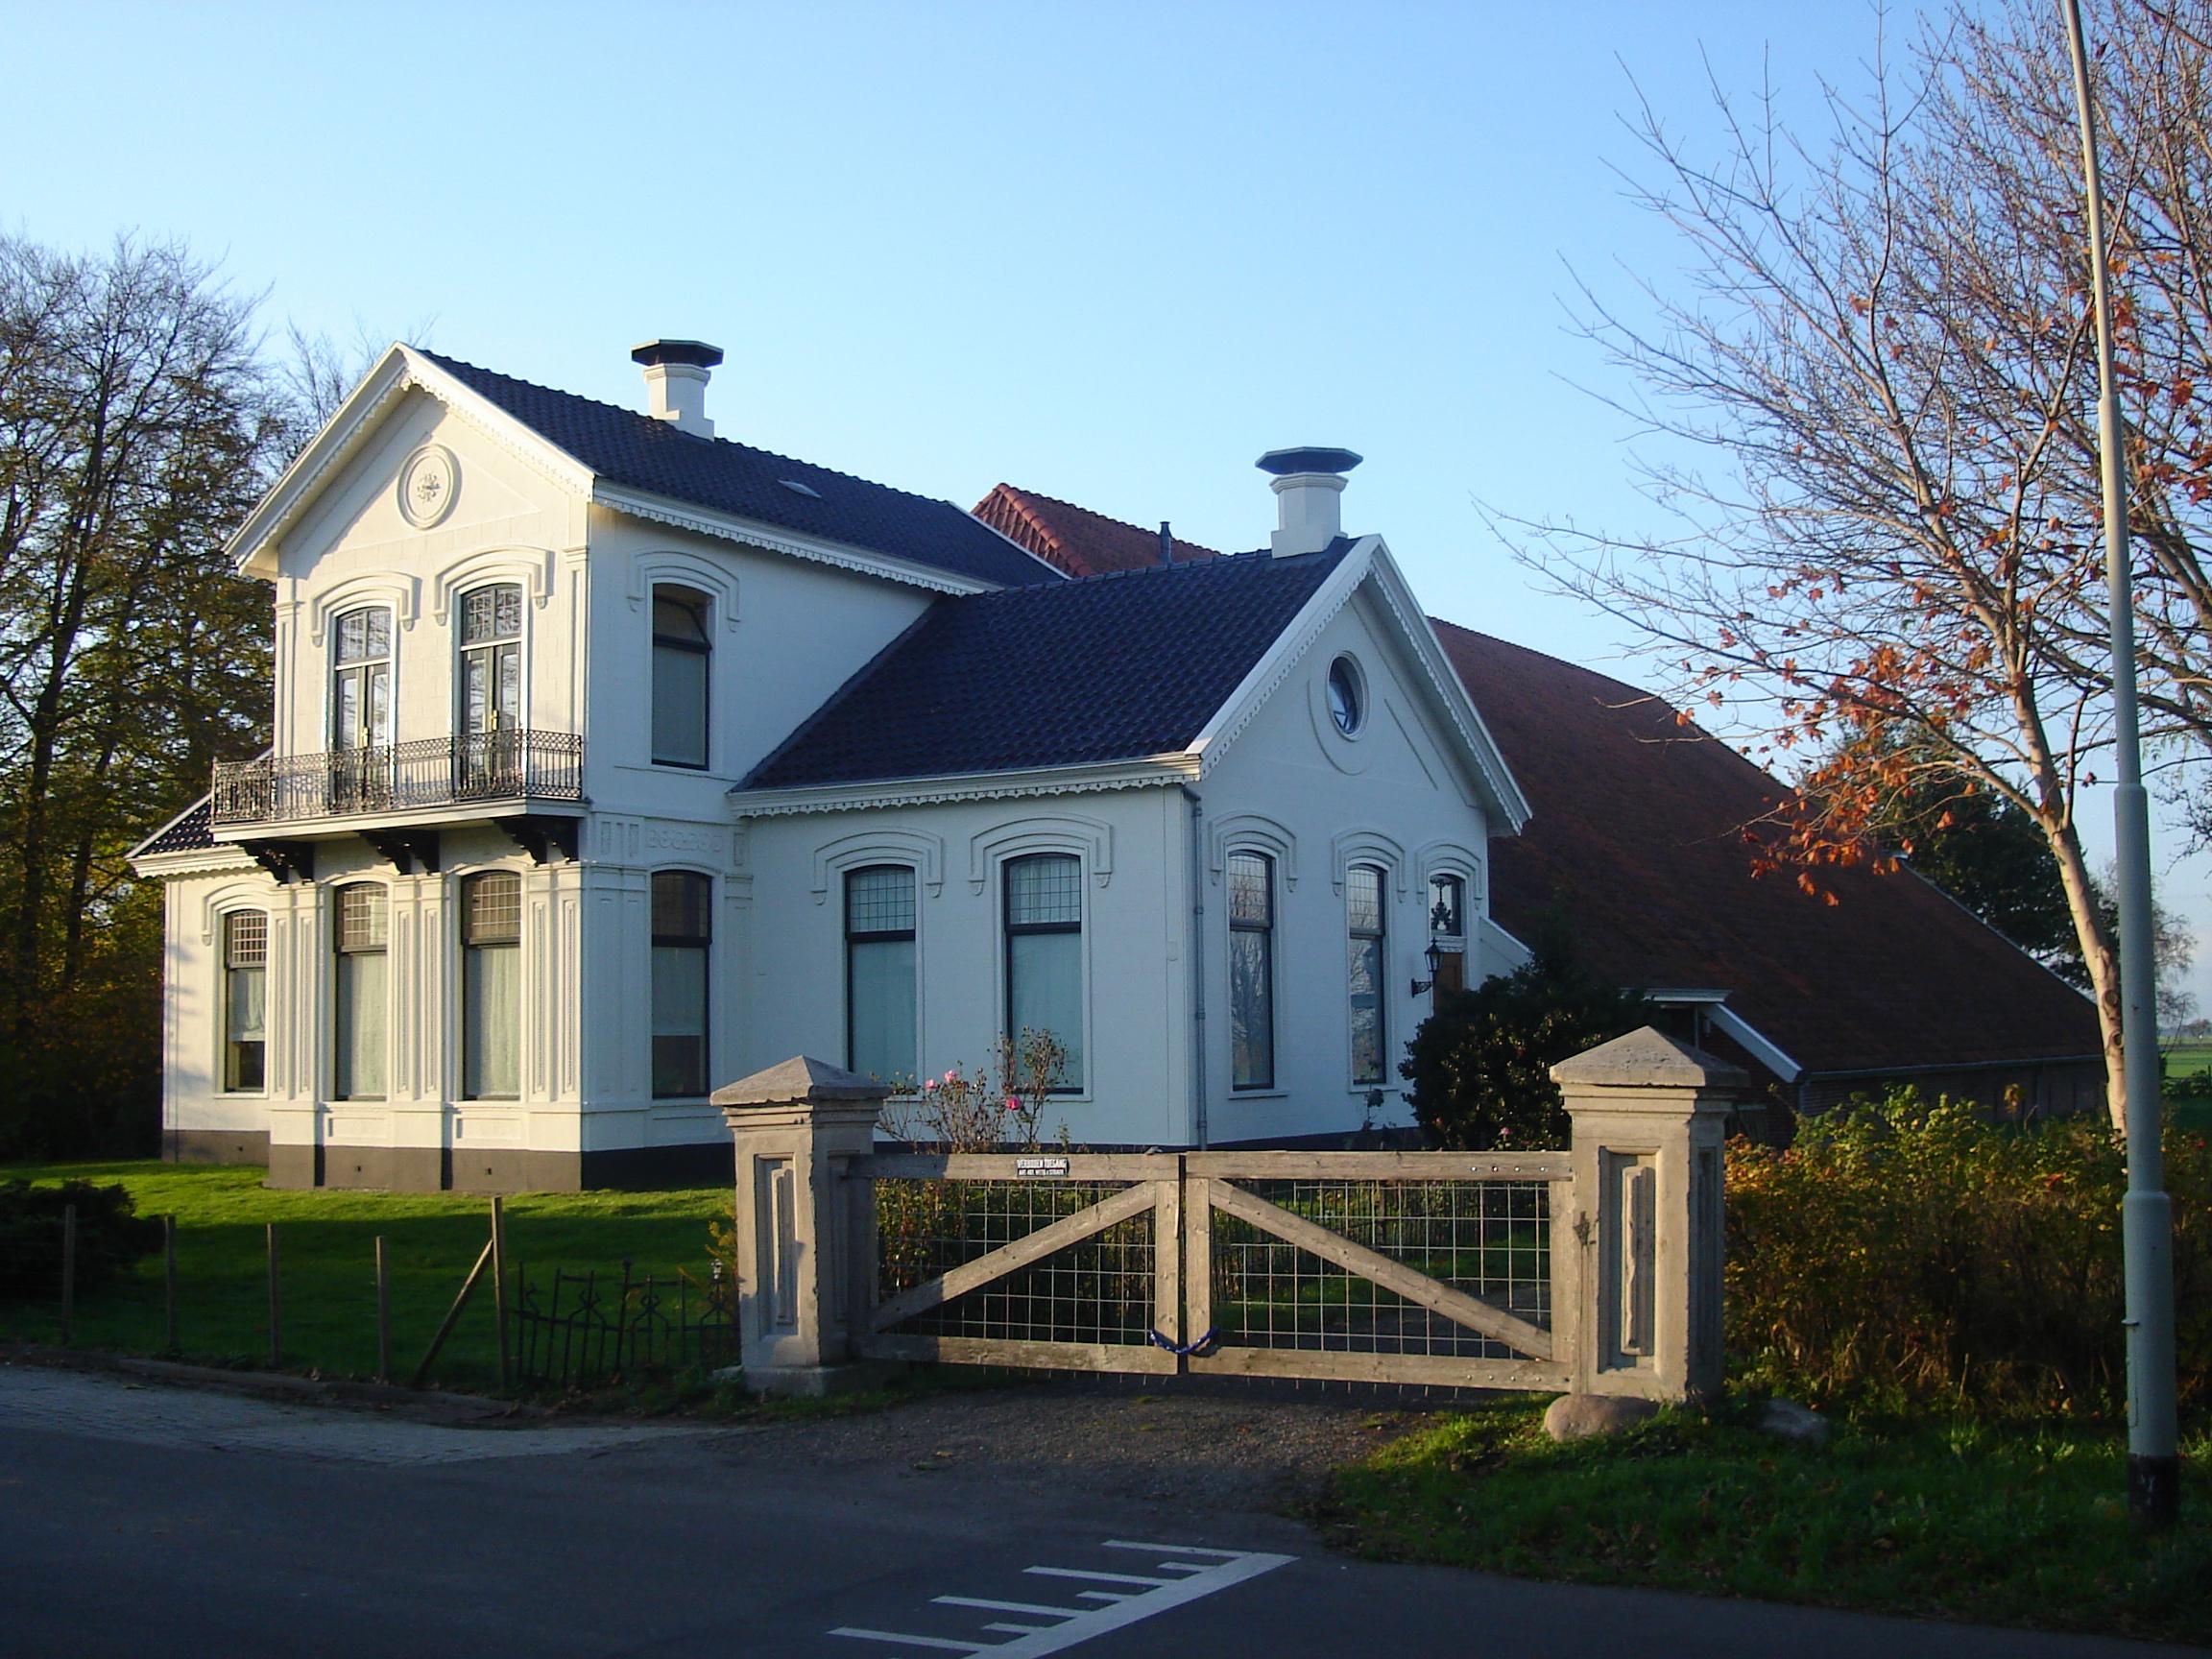 bestand farmhouse oosterstraat scheemda netherlands jpg